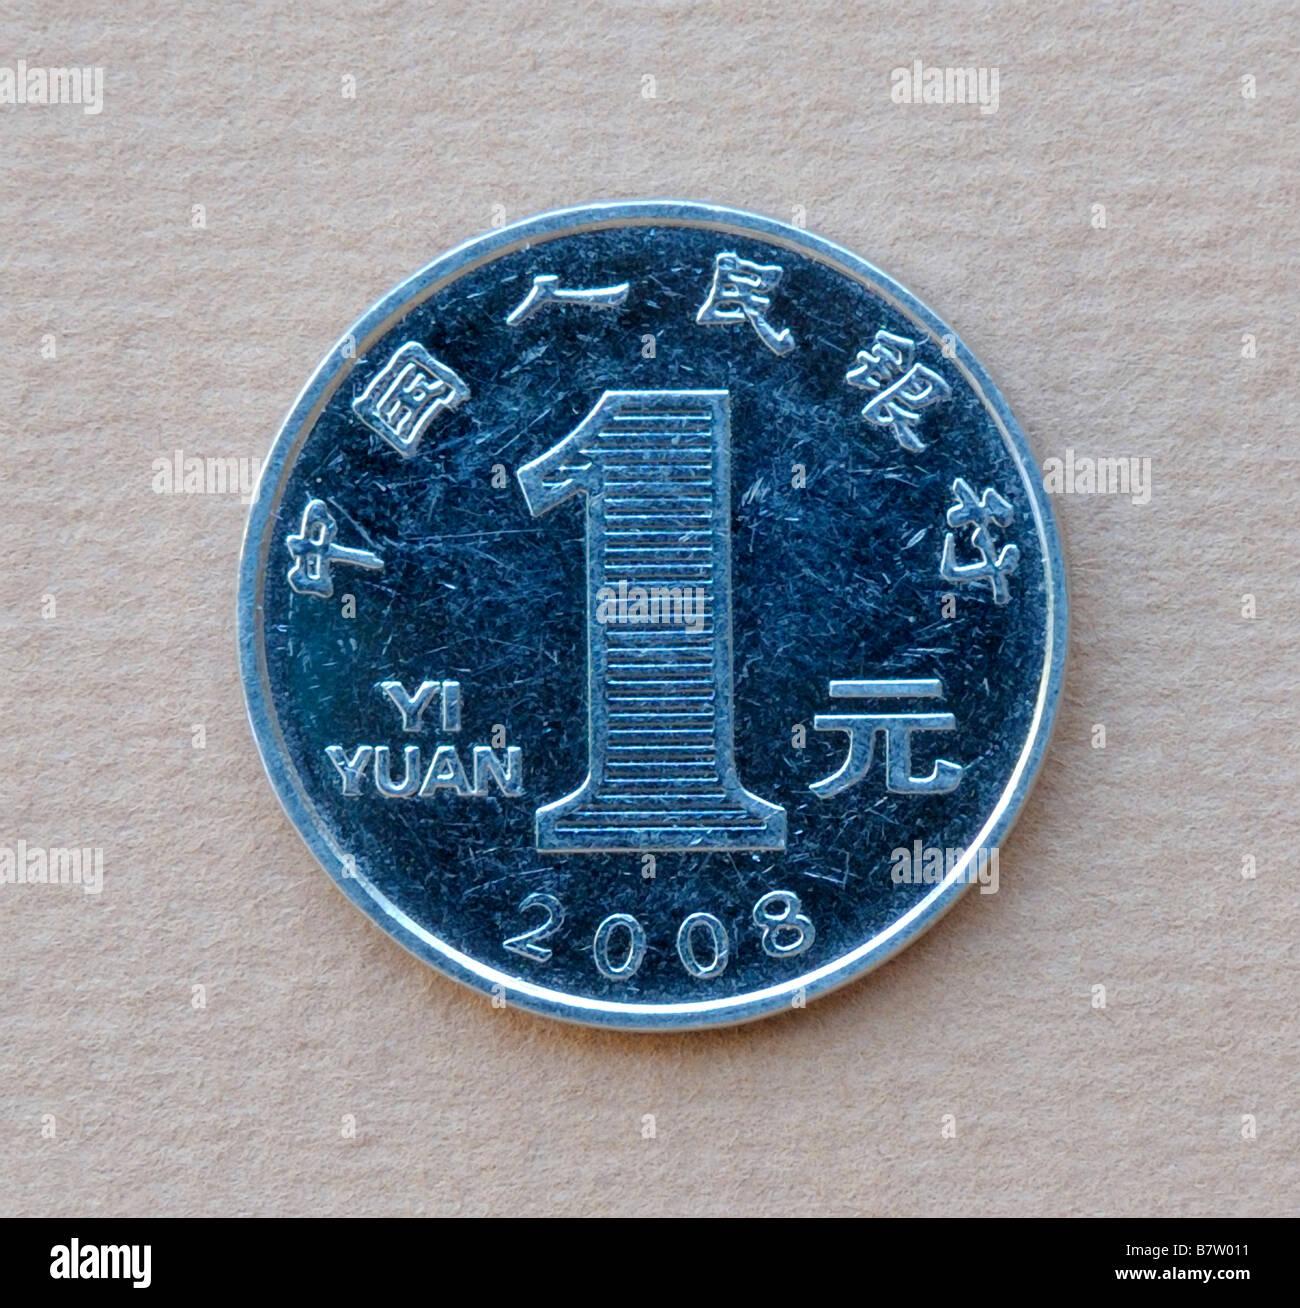 China 1 One Yuan Coin - Stock Image